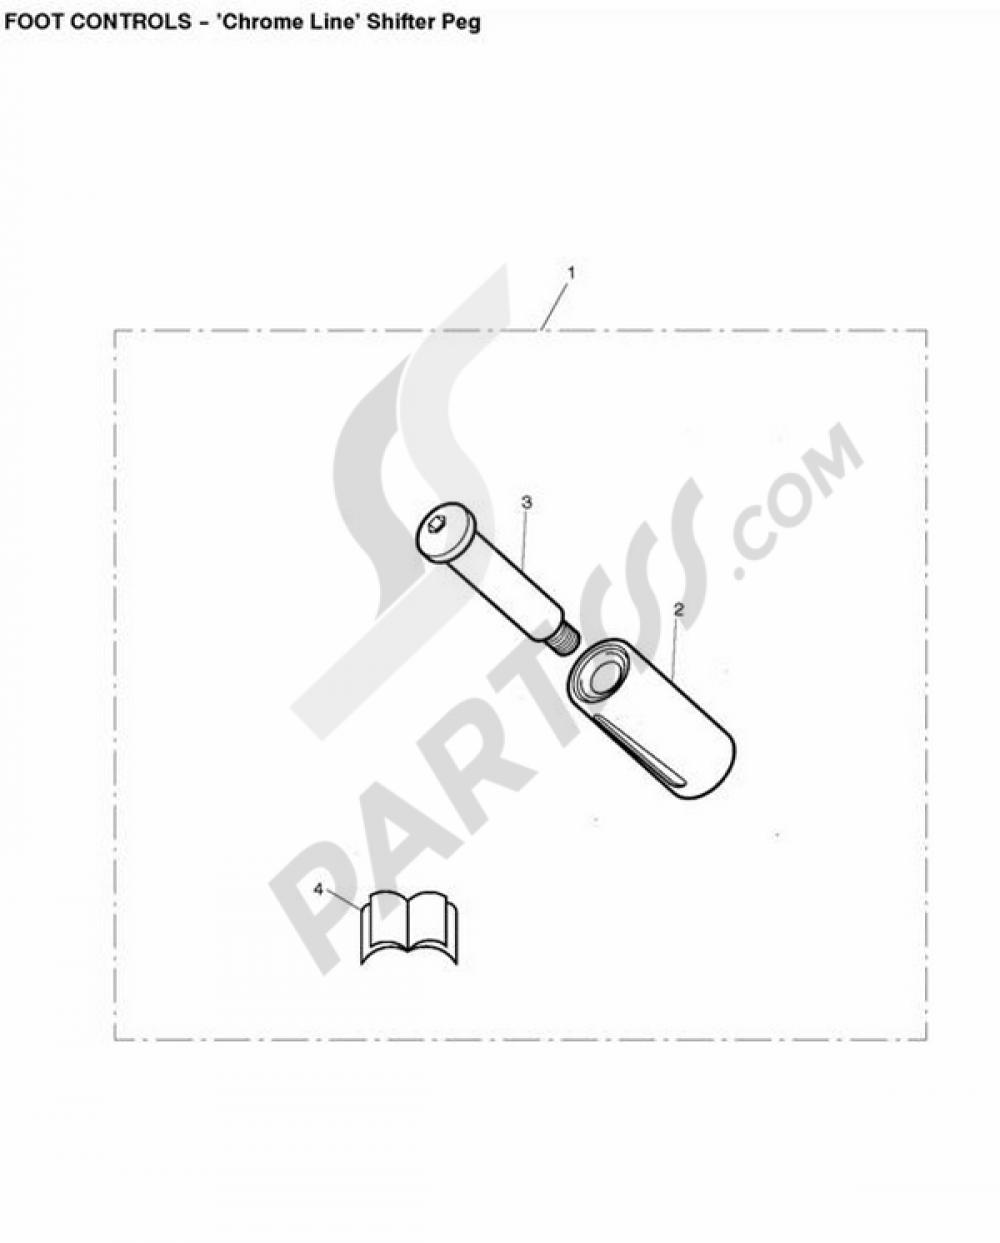 Chrome Line Shifter Peg Triumph Thunderbird 1600 Wiring Diagram